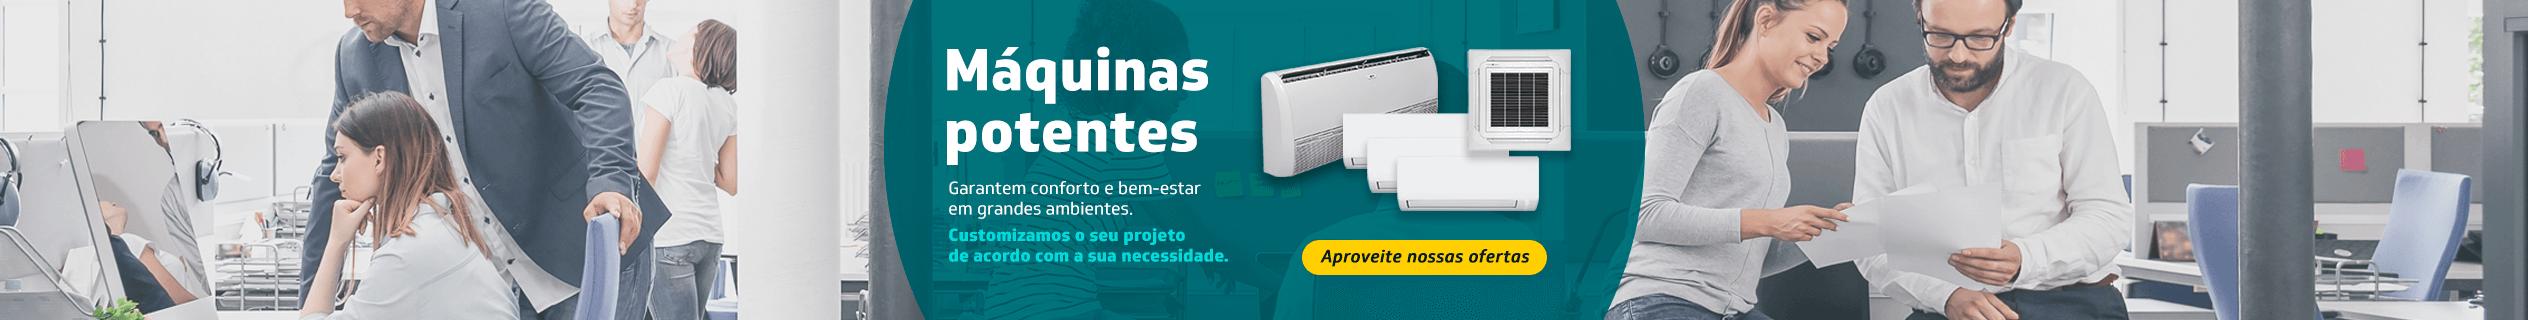 full_banner-desktop-maquinas-potentes-1401-2701-1